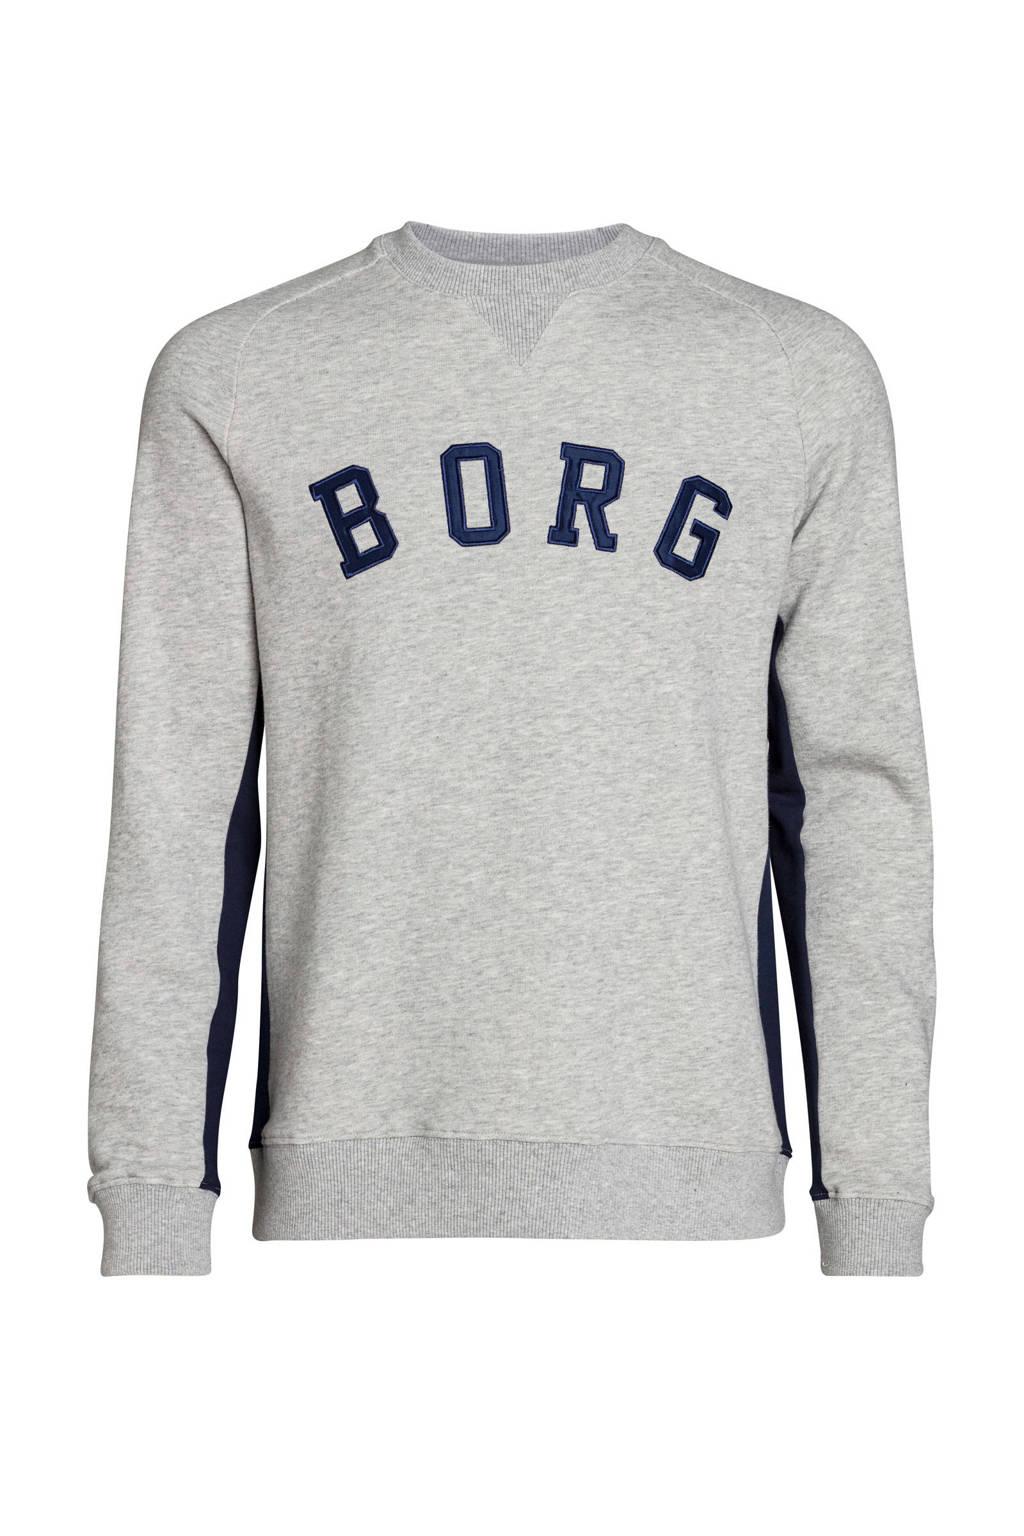 Björn Borg   sportsweater grijs melange, Grijs melange/blauw